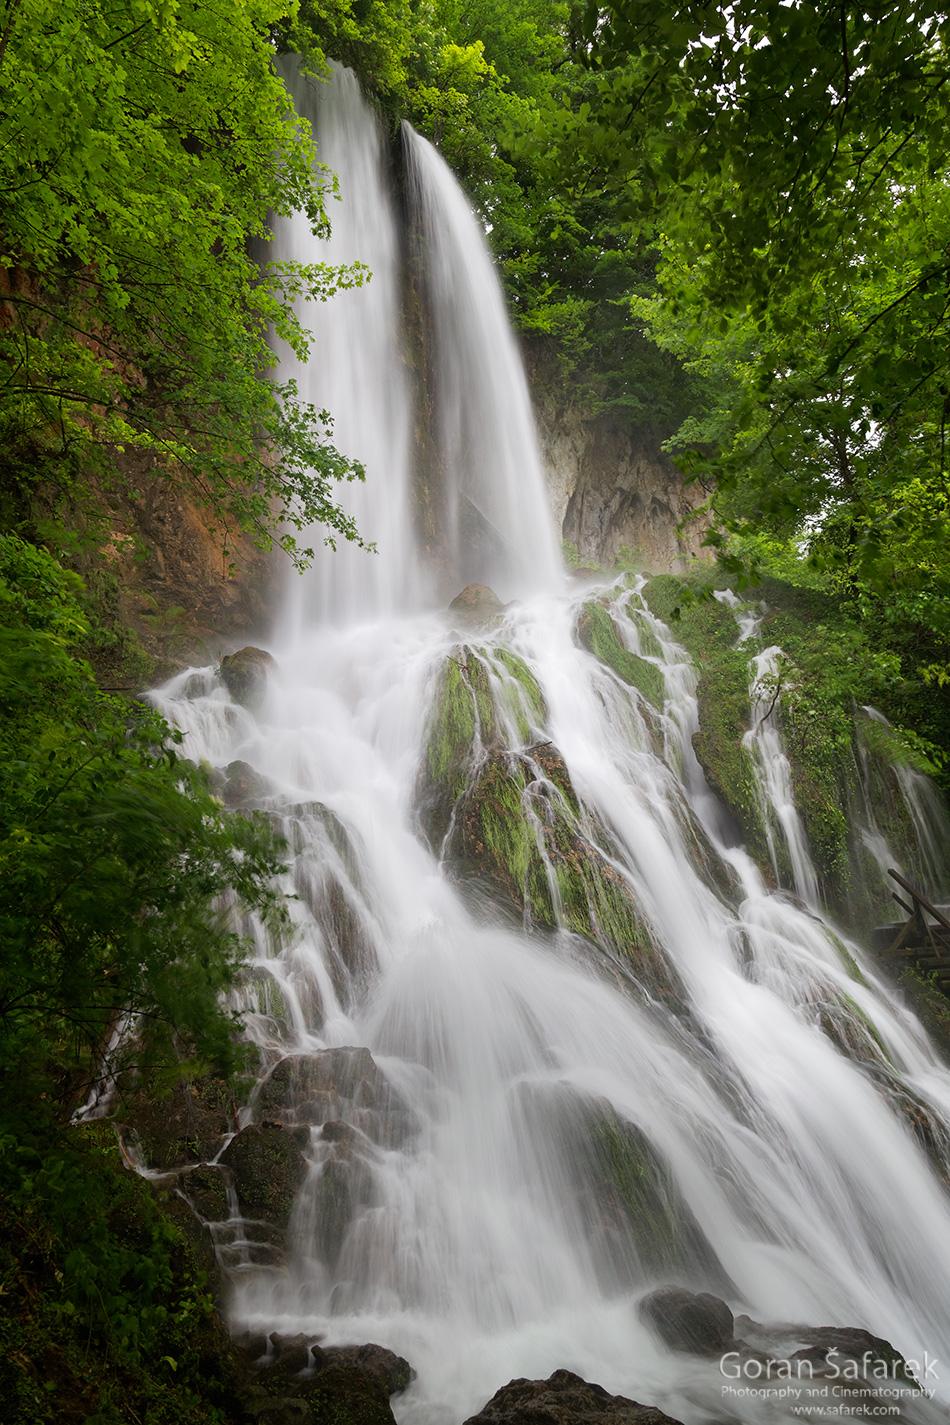 papuk, croatia, stream, mountain, nature park, slavonia, rapids, waterfall